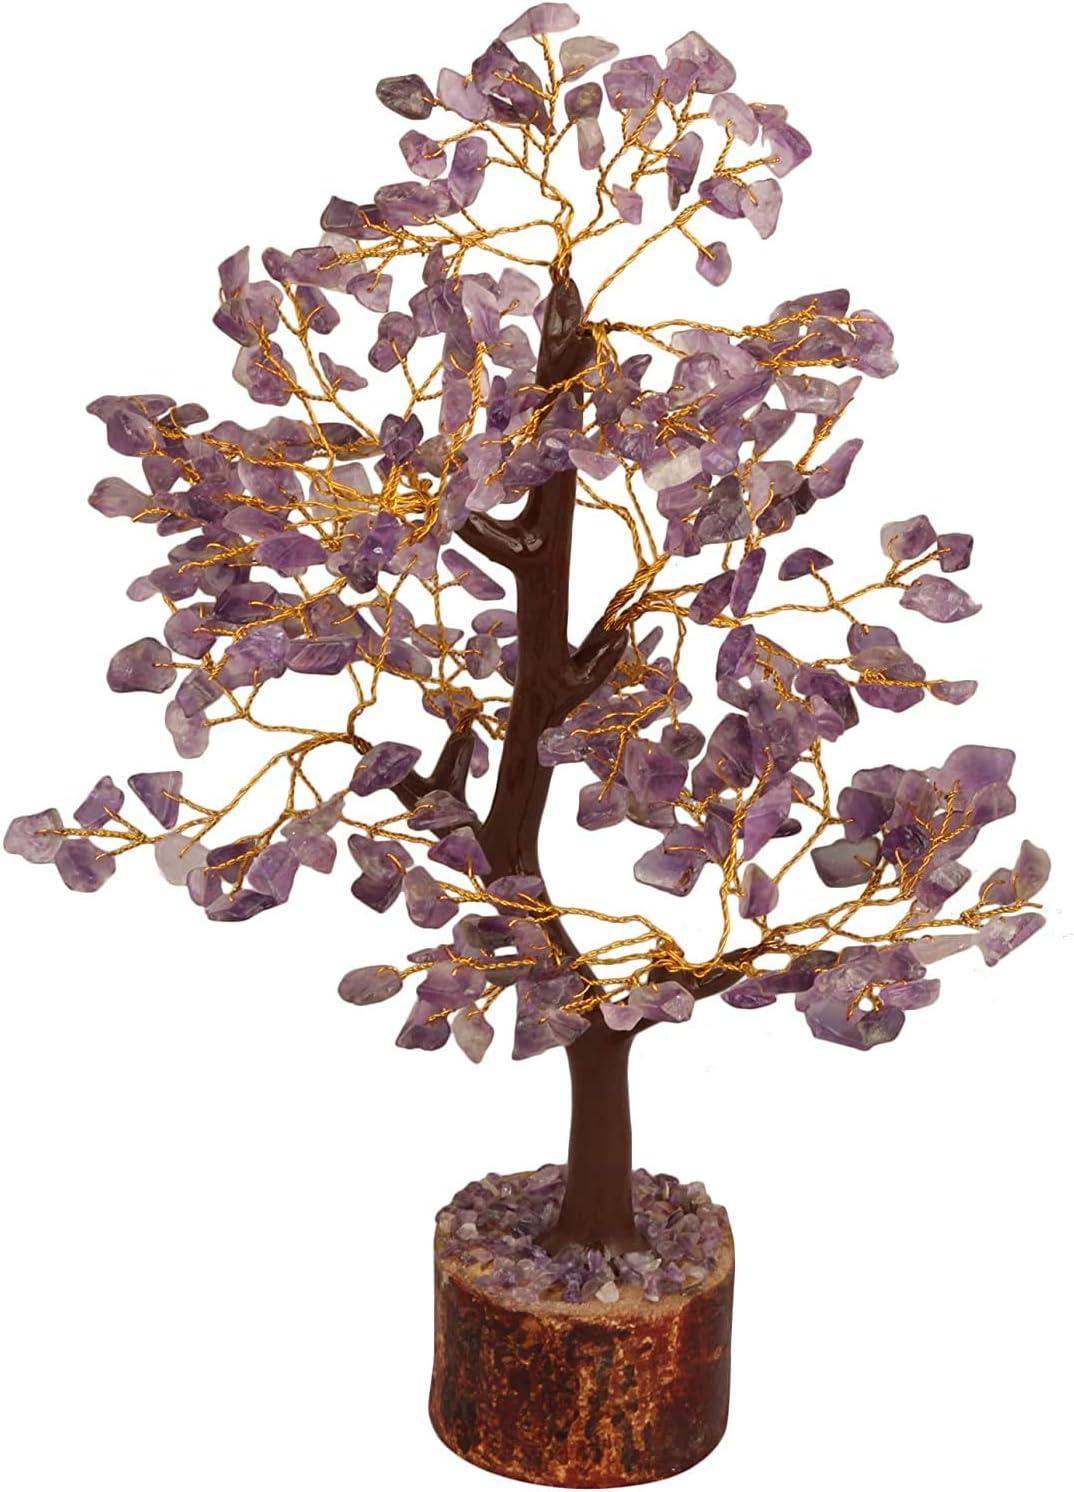 Crocon Amethyst Gemstone Money Tree Feng Shui Bonsai for Reiki Healing Chakra Stone Balancing Energy Generator Spiritual Meditation Home Interior Office Decor Size 10-12 Inch